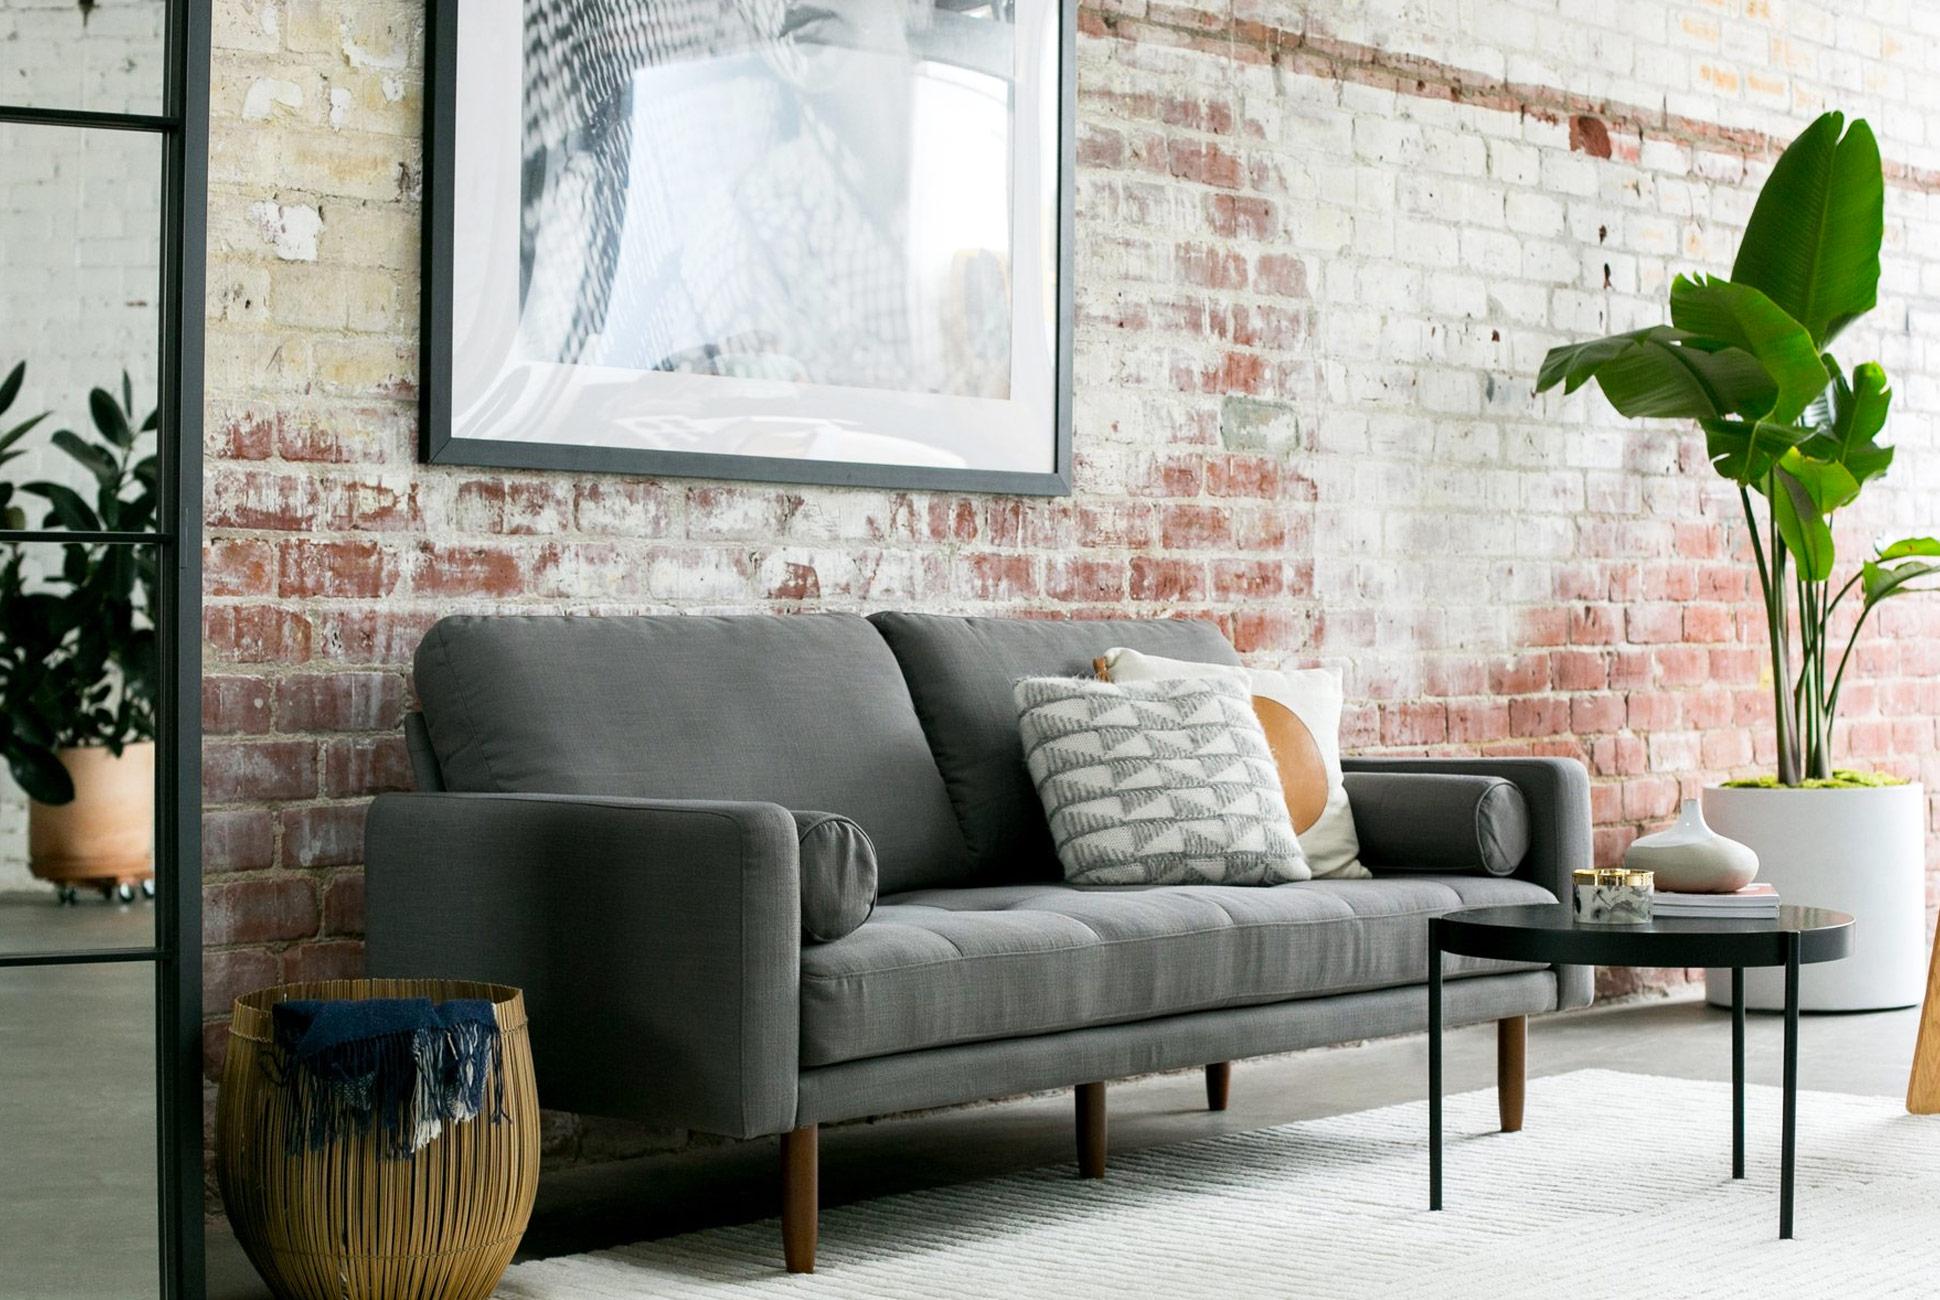 Best Sofa Furniture For Living Room